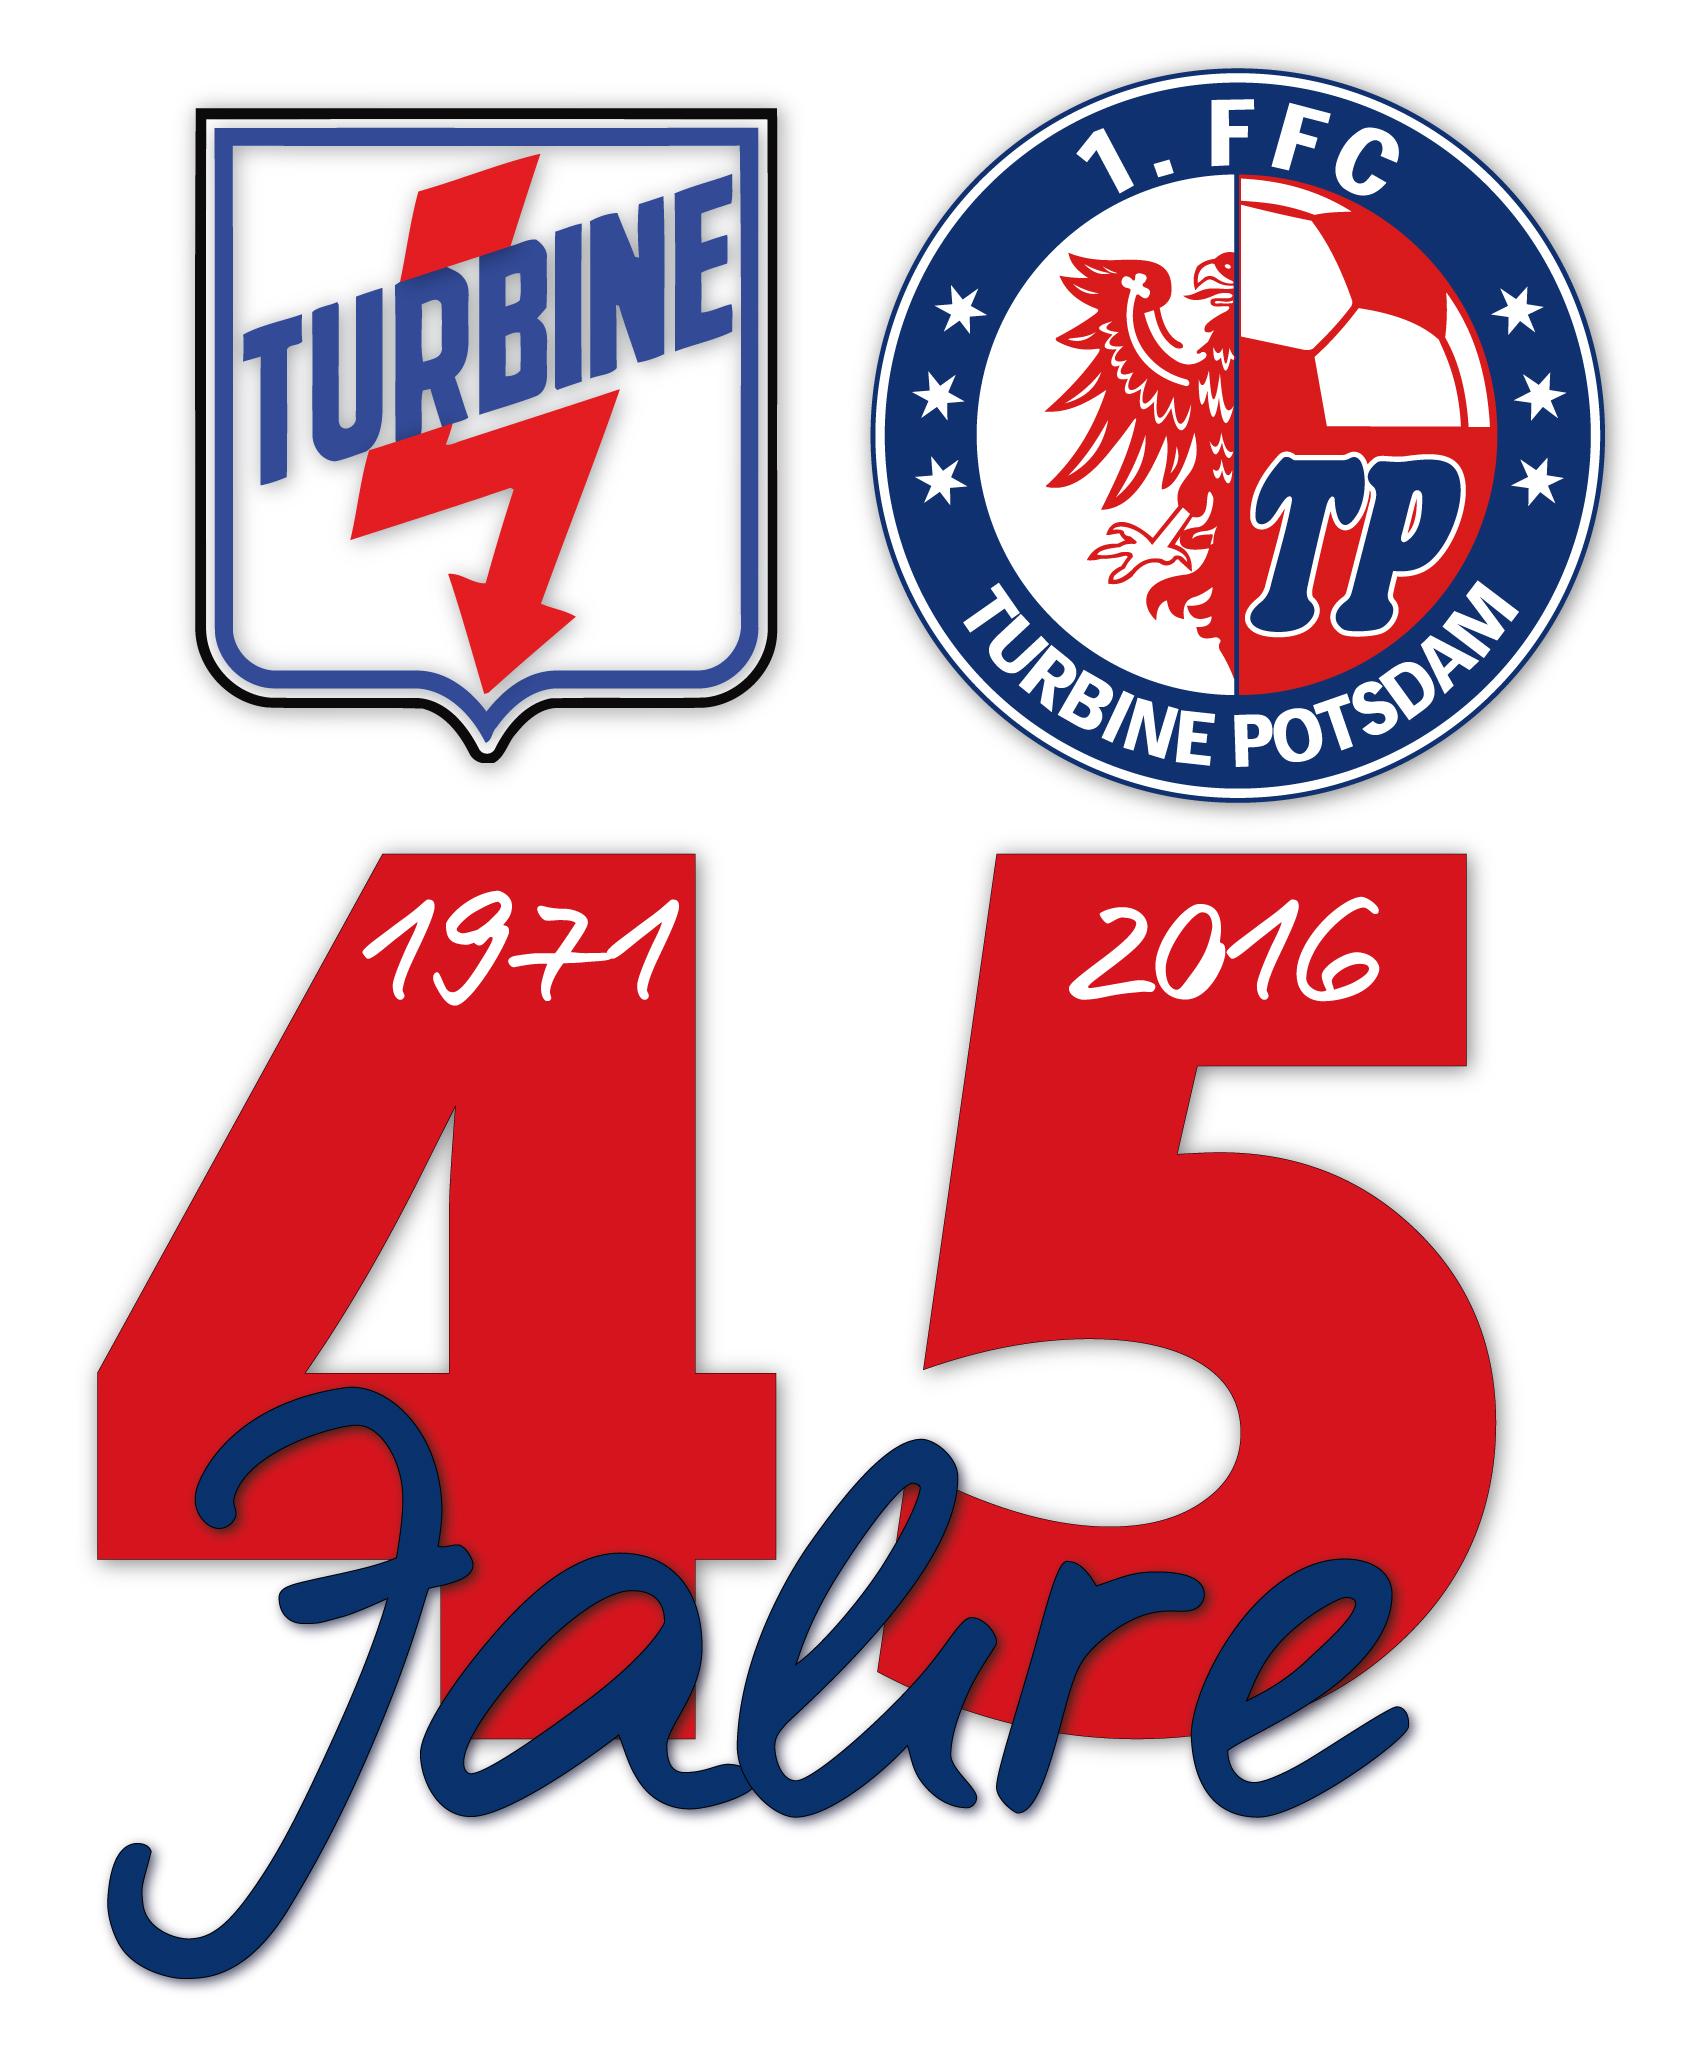 45 Jahre Turbine Potsdam